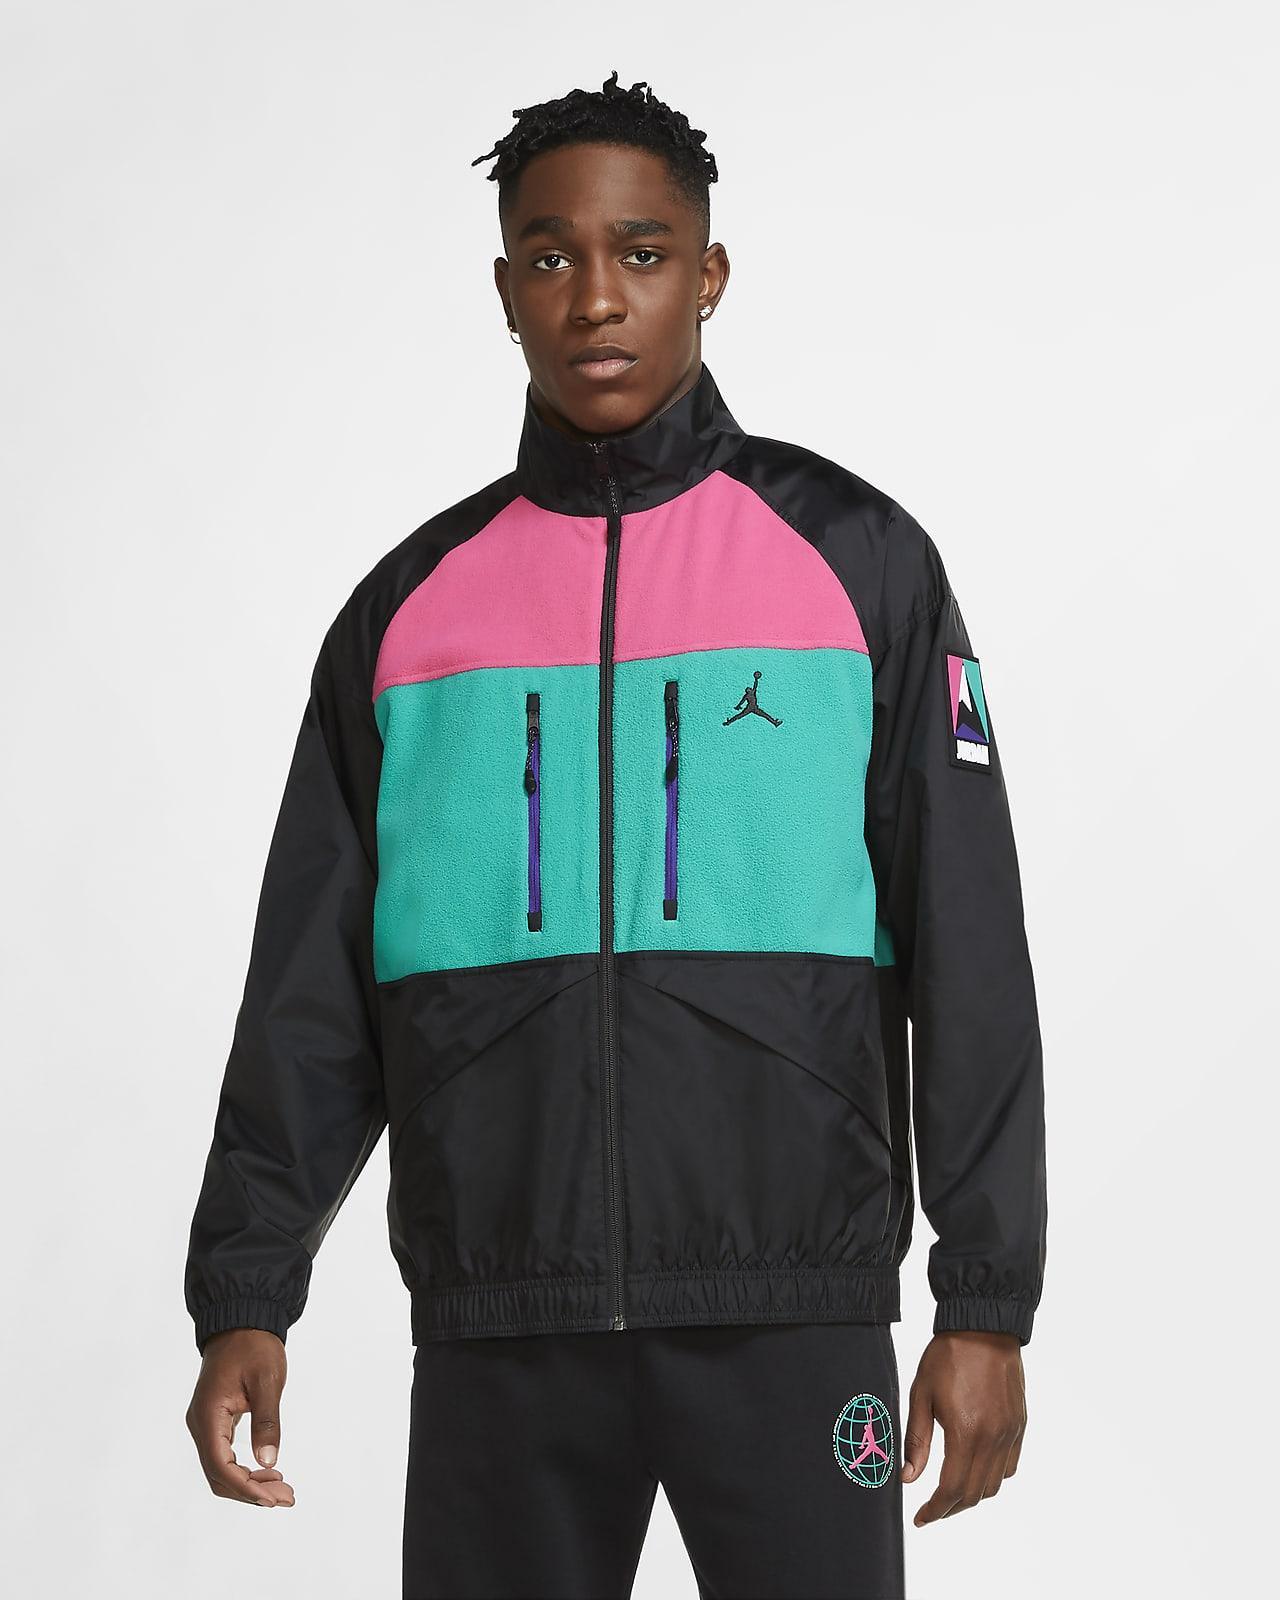 Jordan Winter Utility Men's Jacket